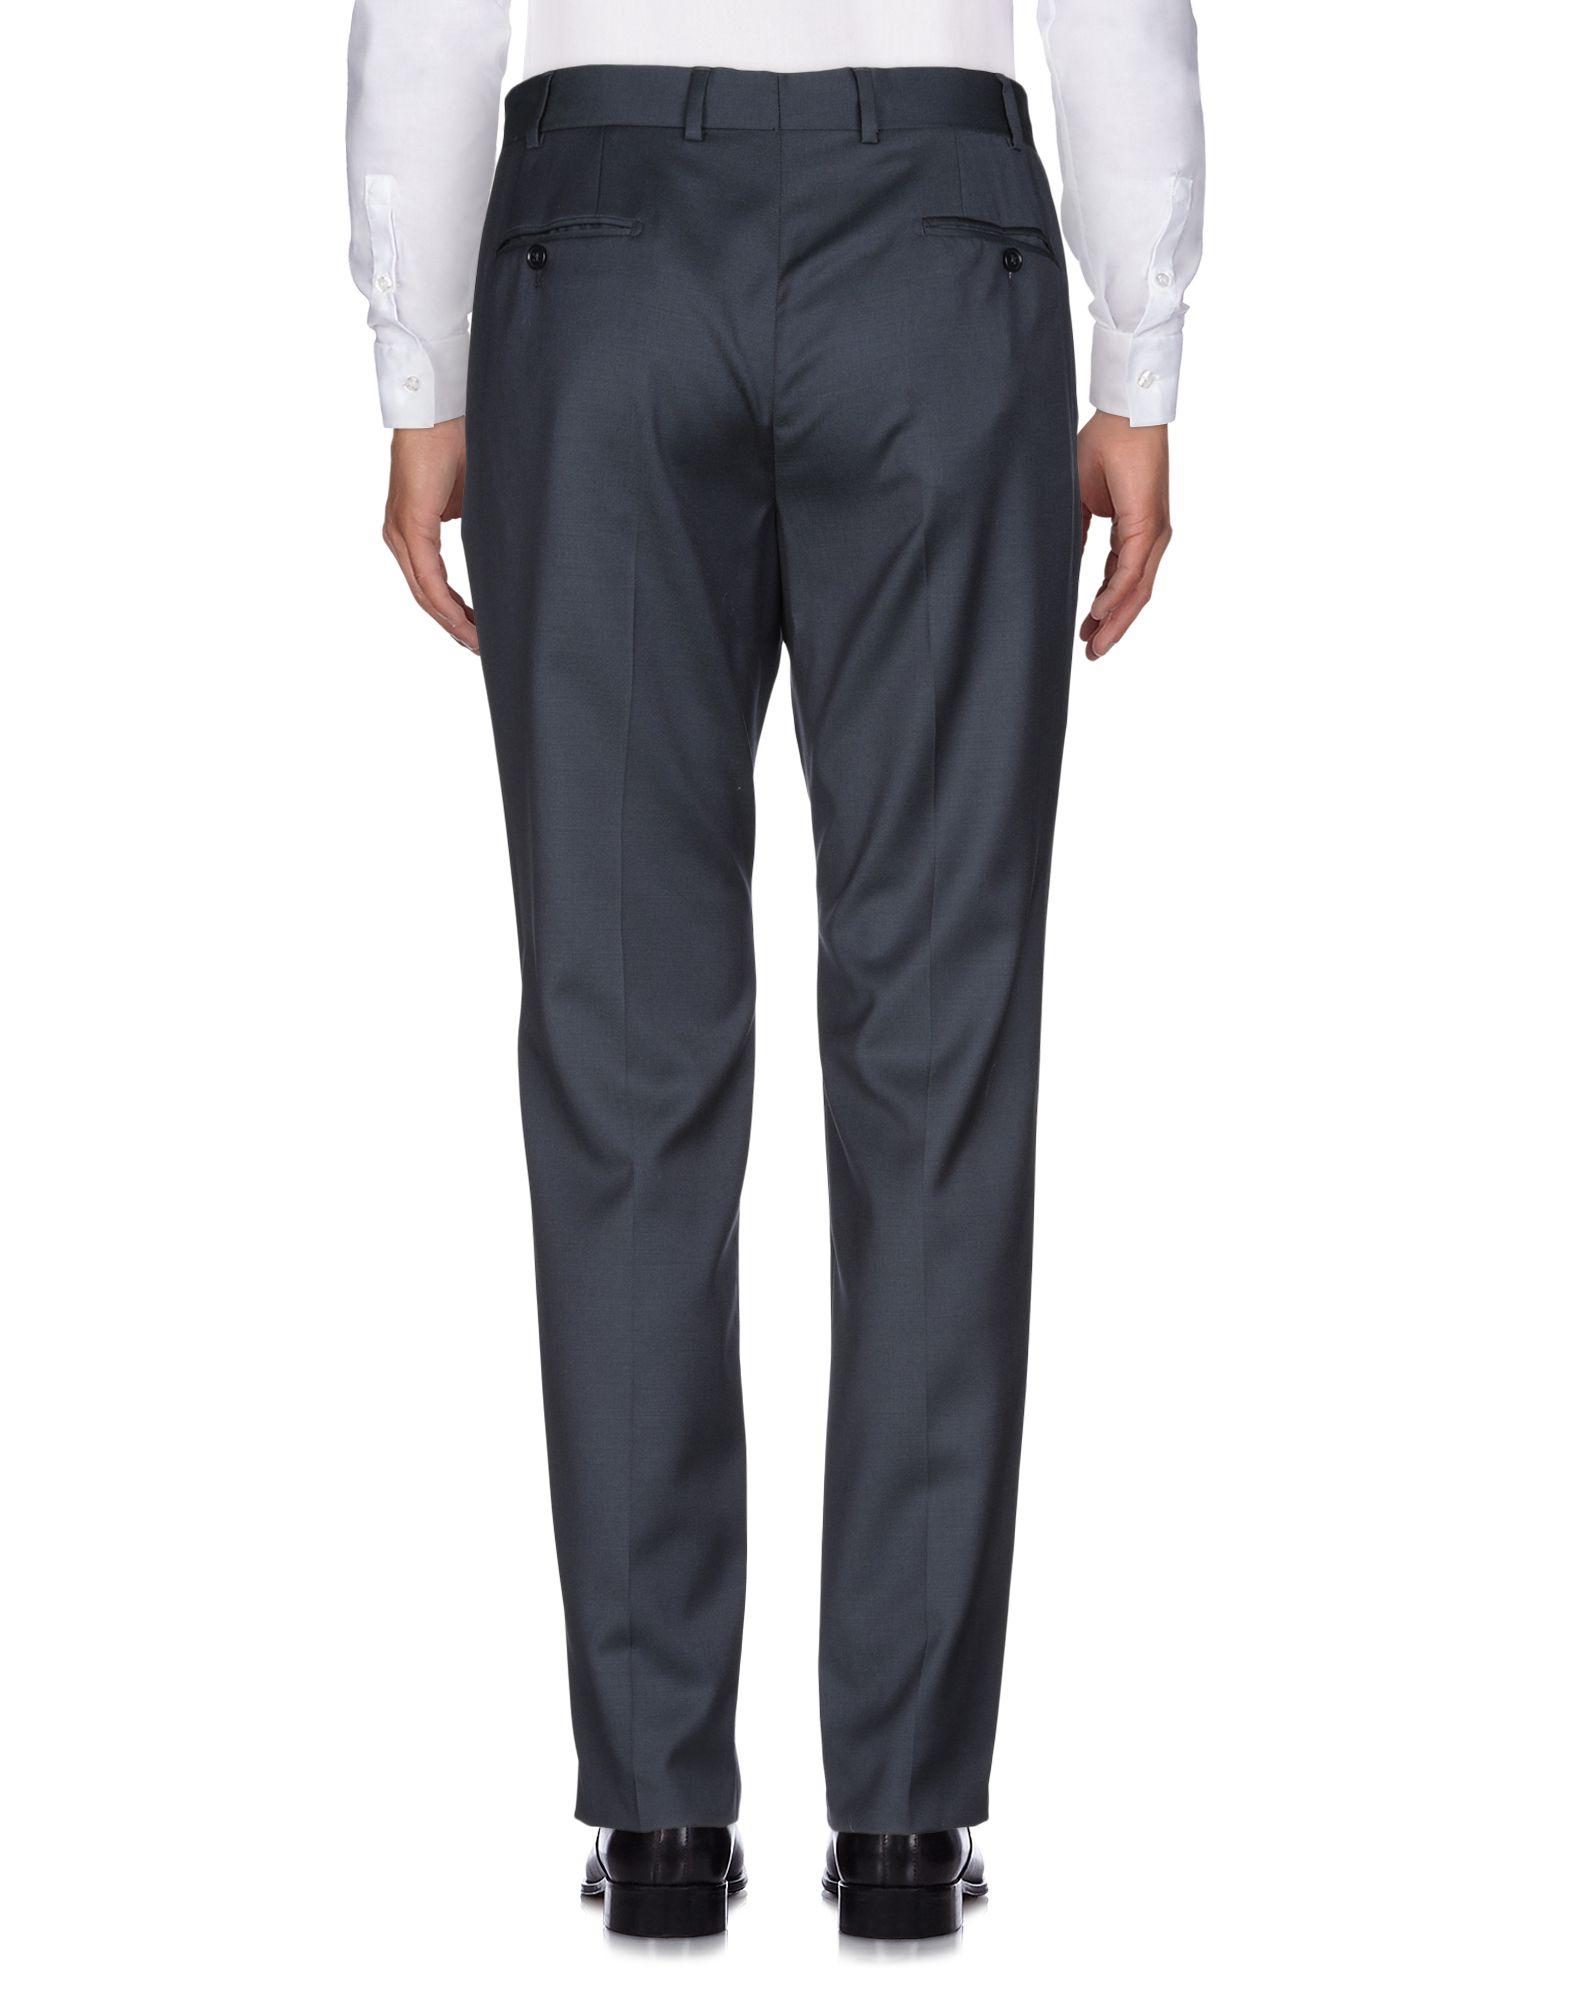 Pantalone Pantalone Pantalone Armani Collezioni Uomo - 13215049TJ f980e0